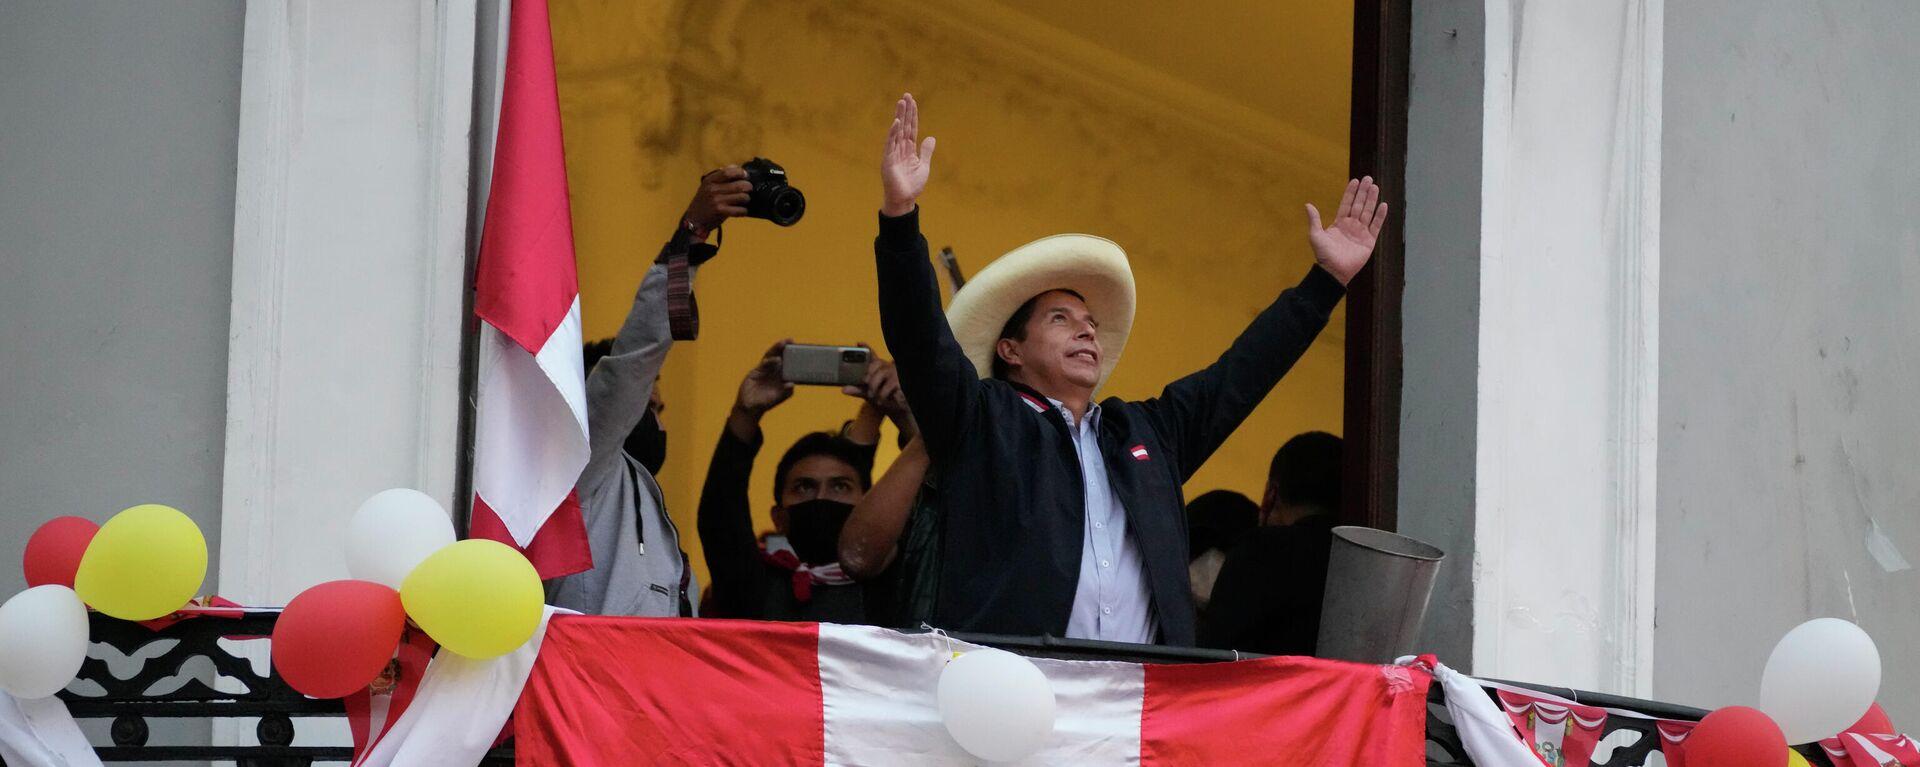 Pedro Castillo, candidato a la presidencia de Perú - Sputnik Mundo, 1920, 16.06.2021